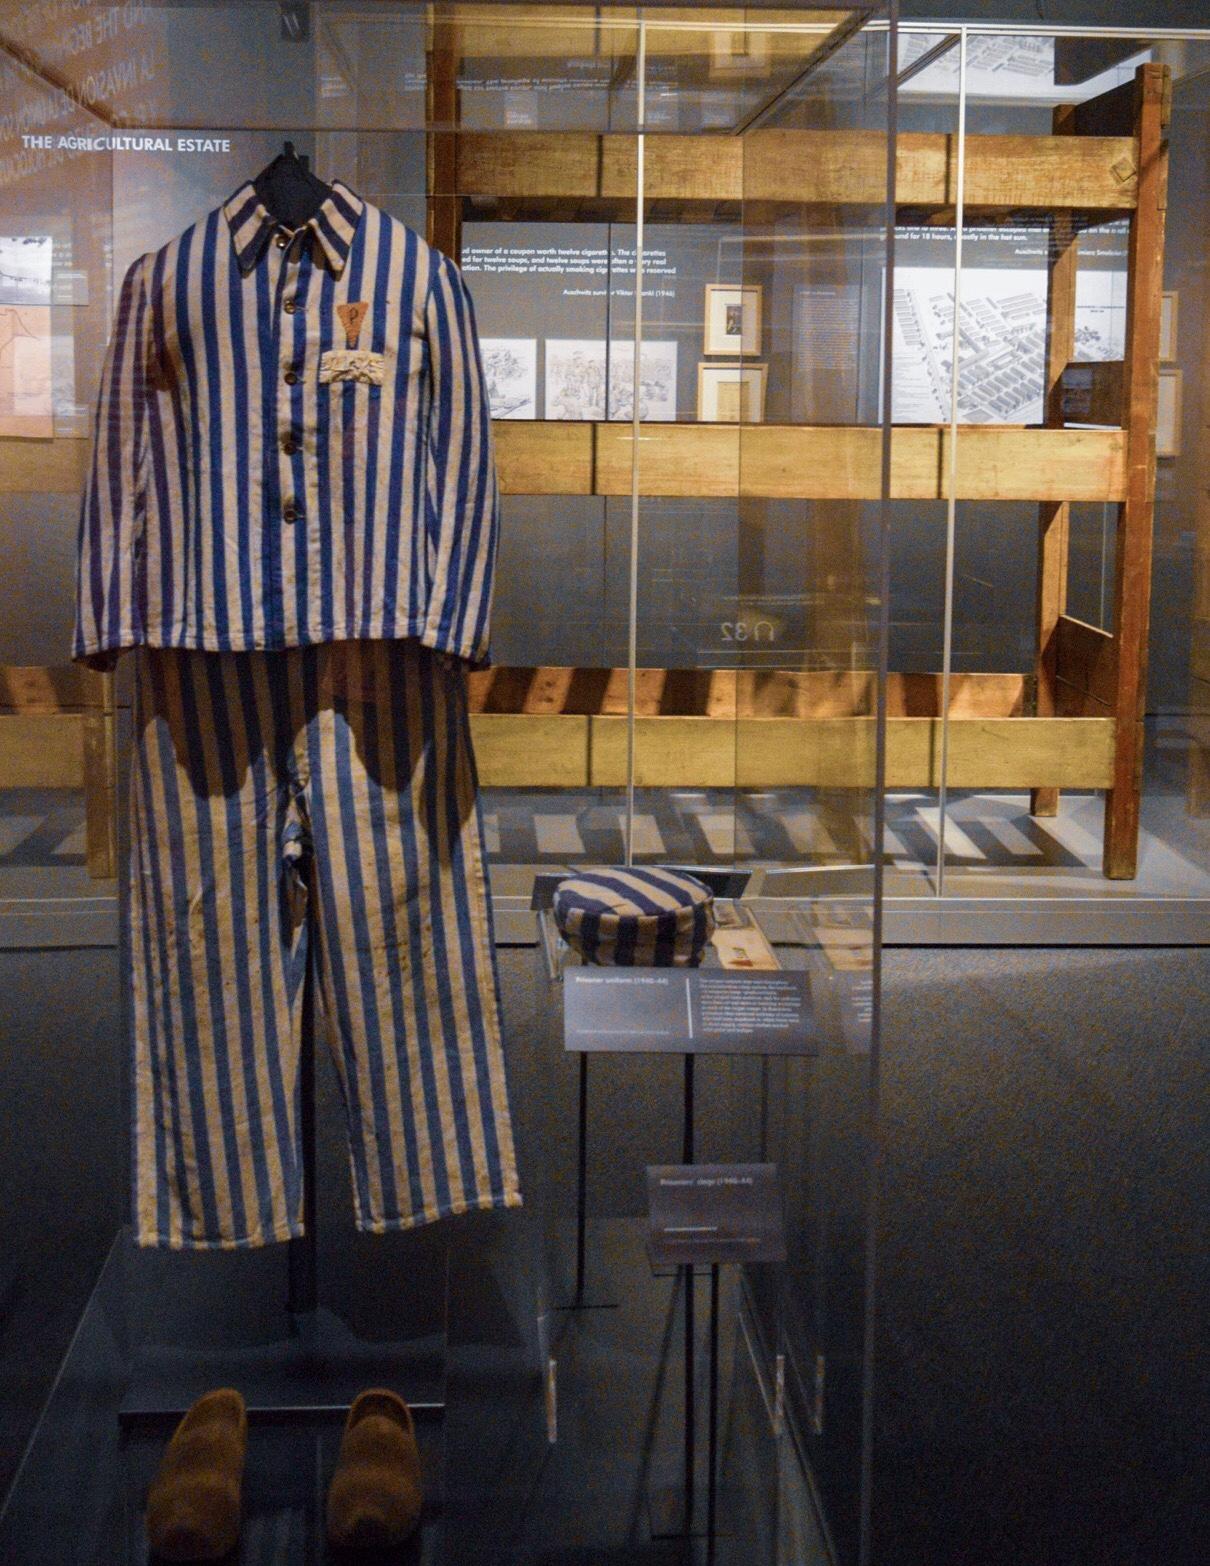 Prisoner clothing and set of bunks